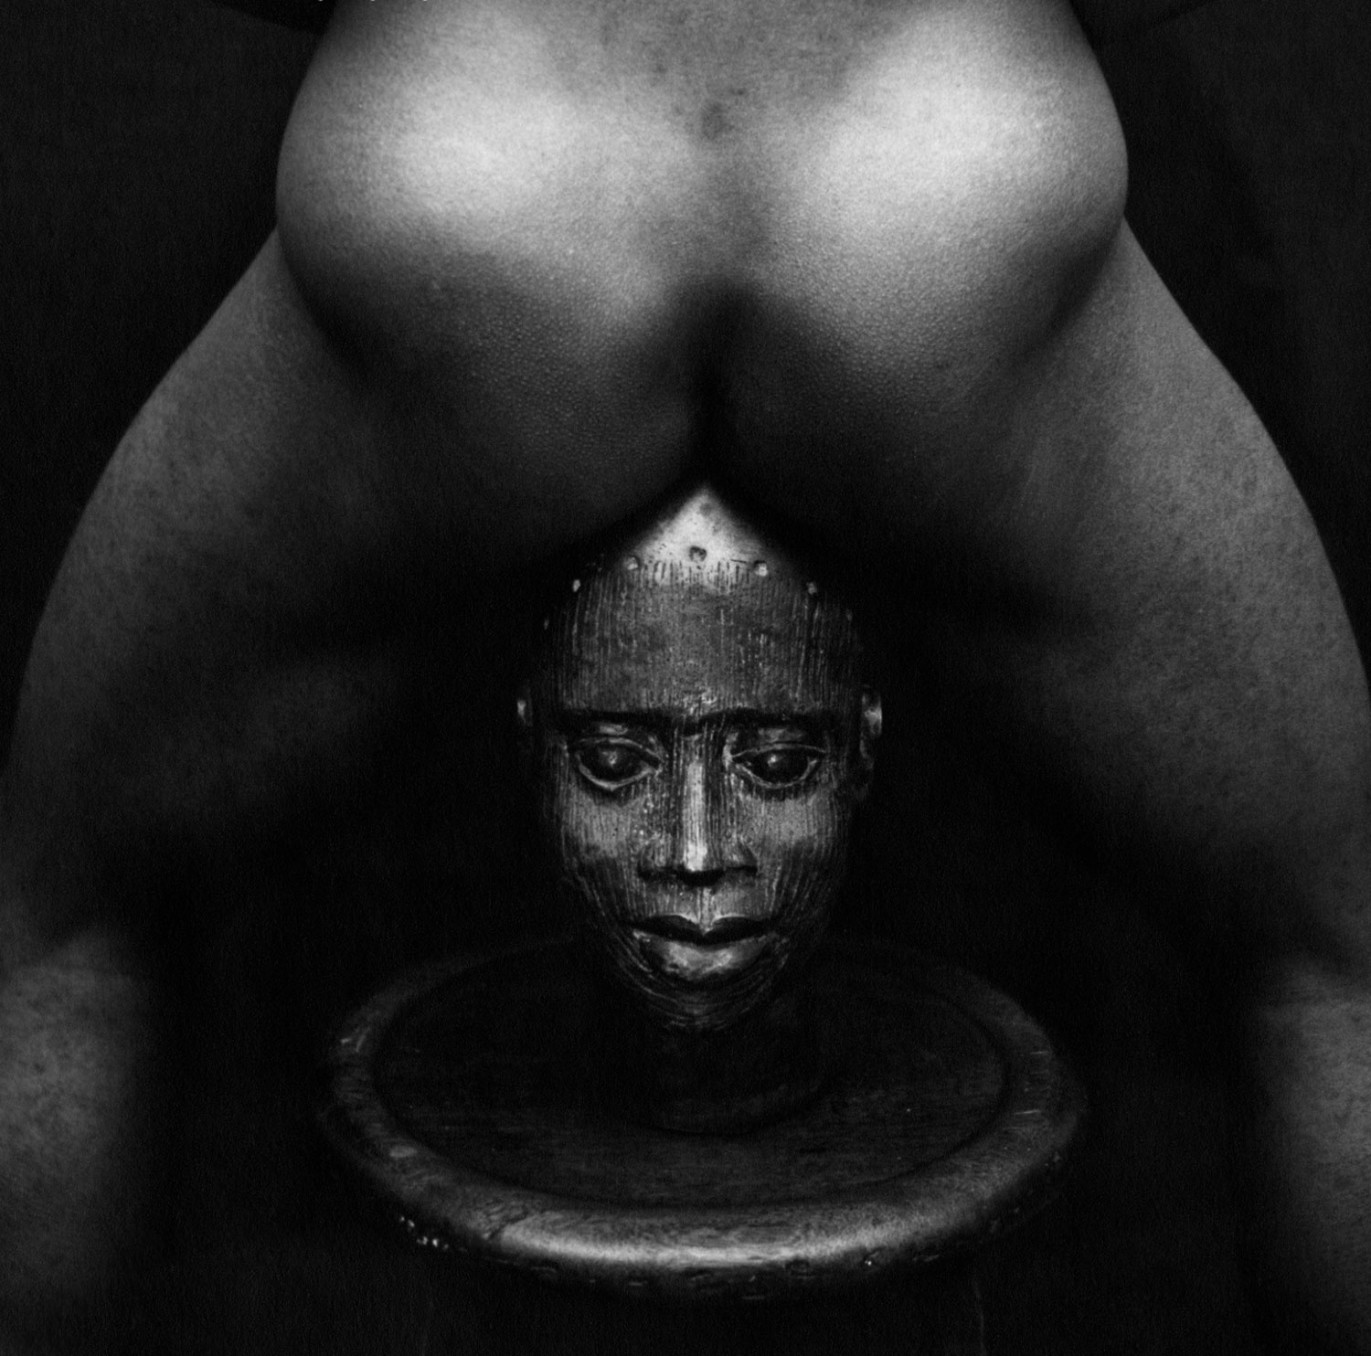 Rotimi Fani-Kayode, Bronze Head, 1987, Gelatin silver print, 30.5 x 40.6 cm, 12 x 16 in, Framed: 44.8 x 42.2 cm, 17 5/8 x 16 5/8 in